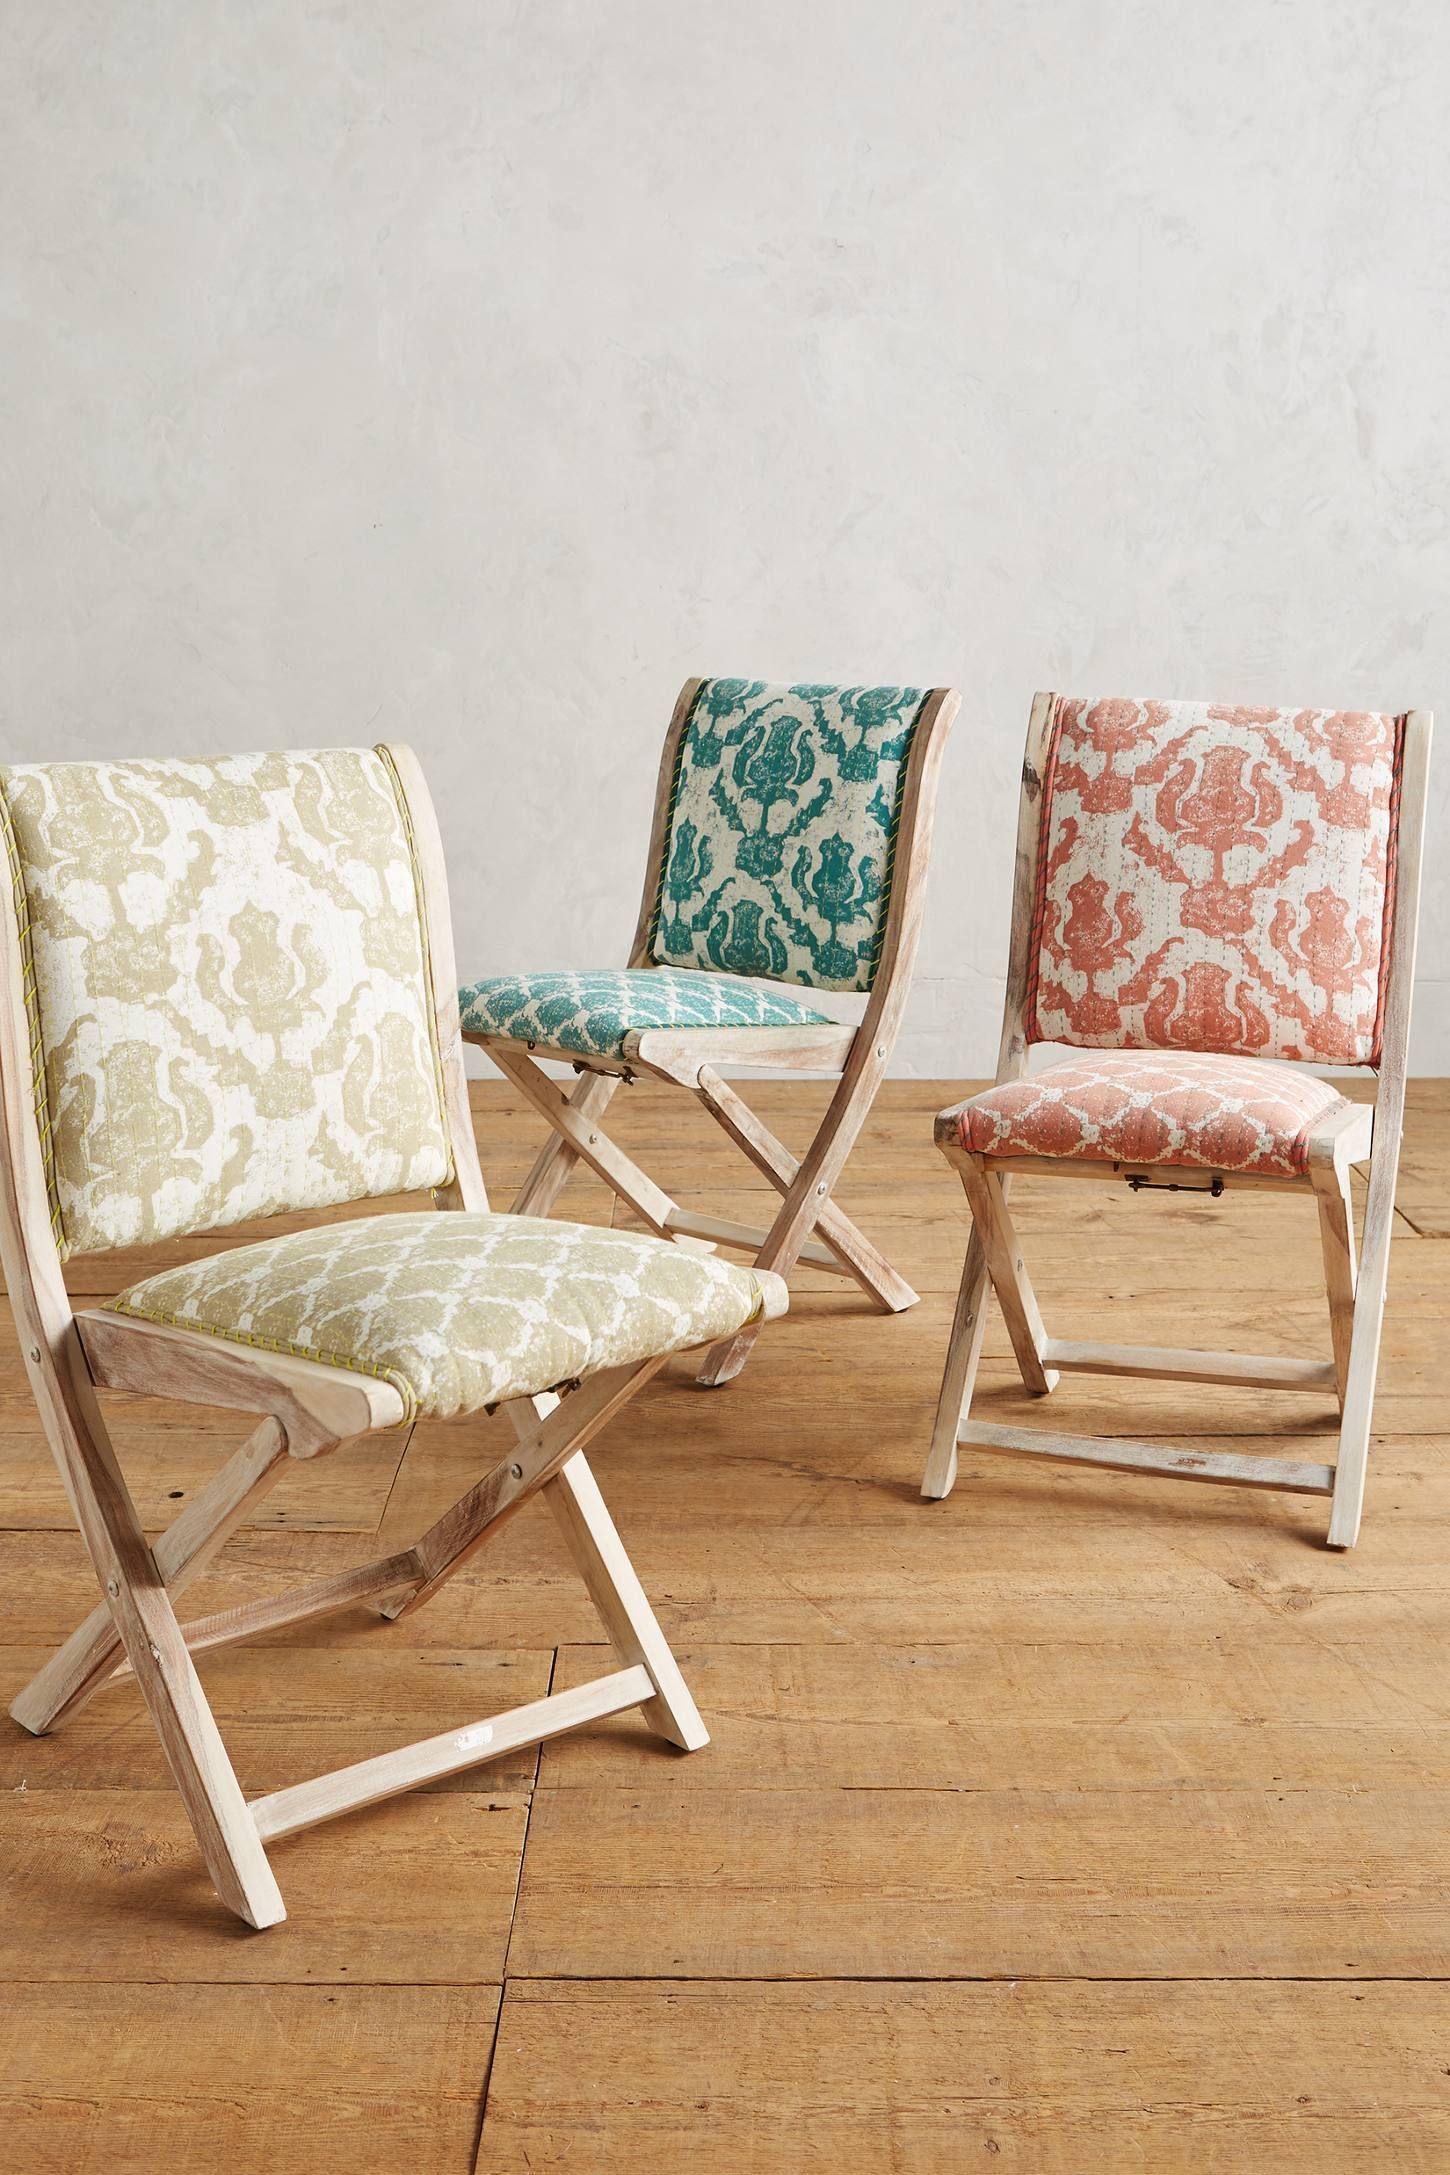 terai folding chair fun sits folding chair chair home decor rh pinterest co uk